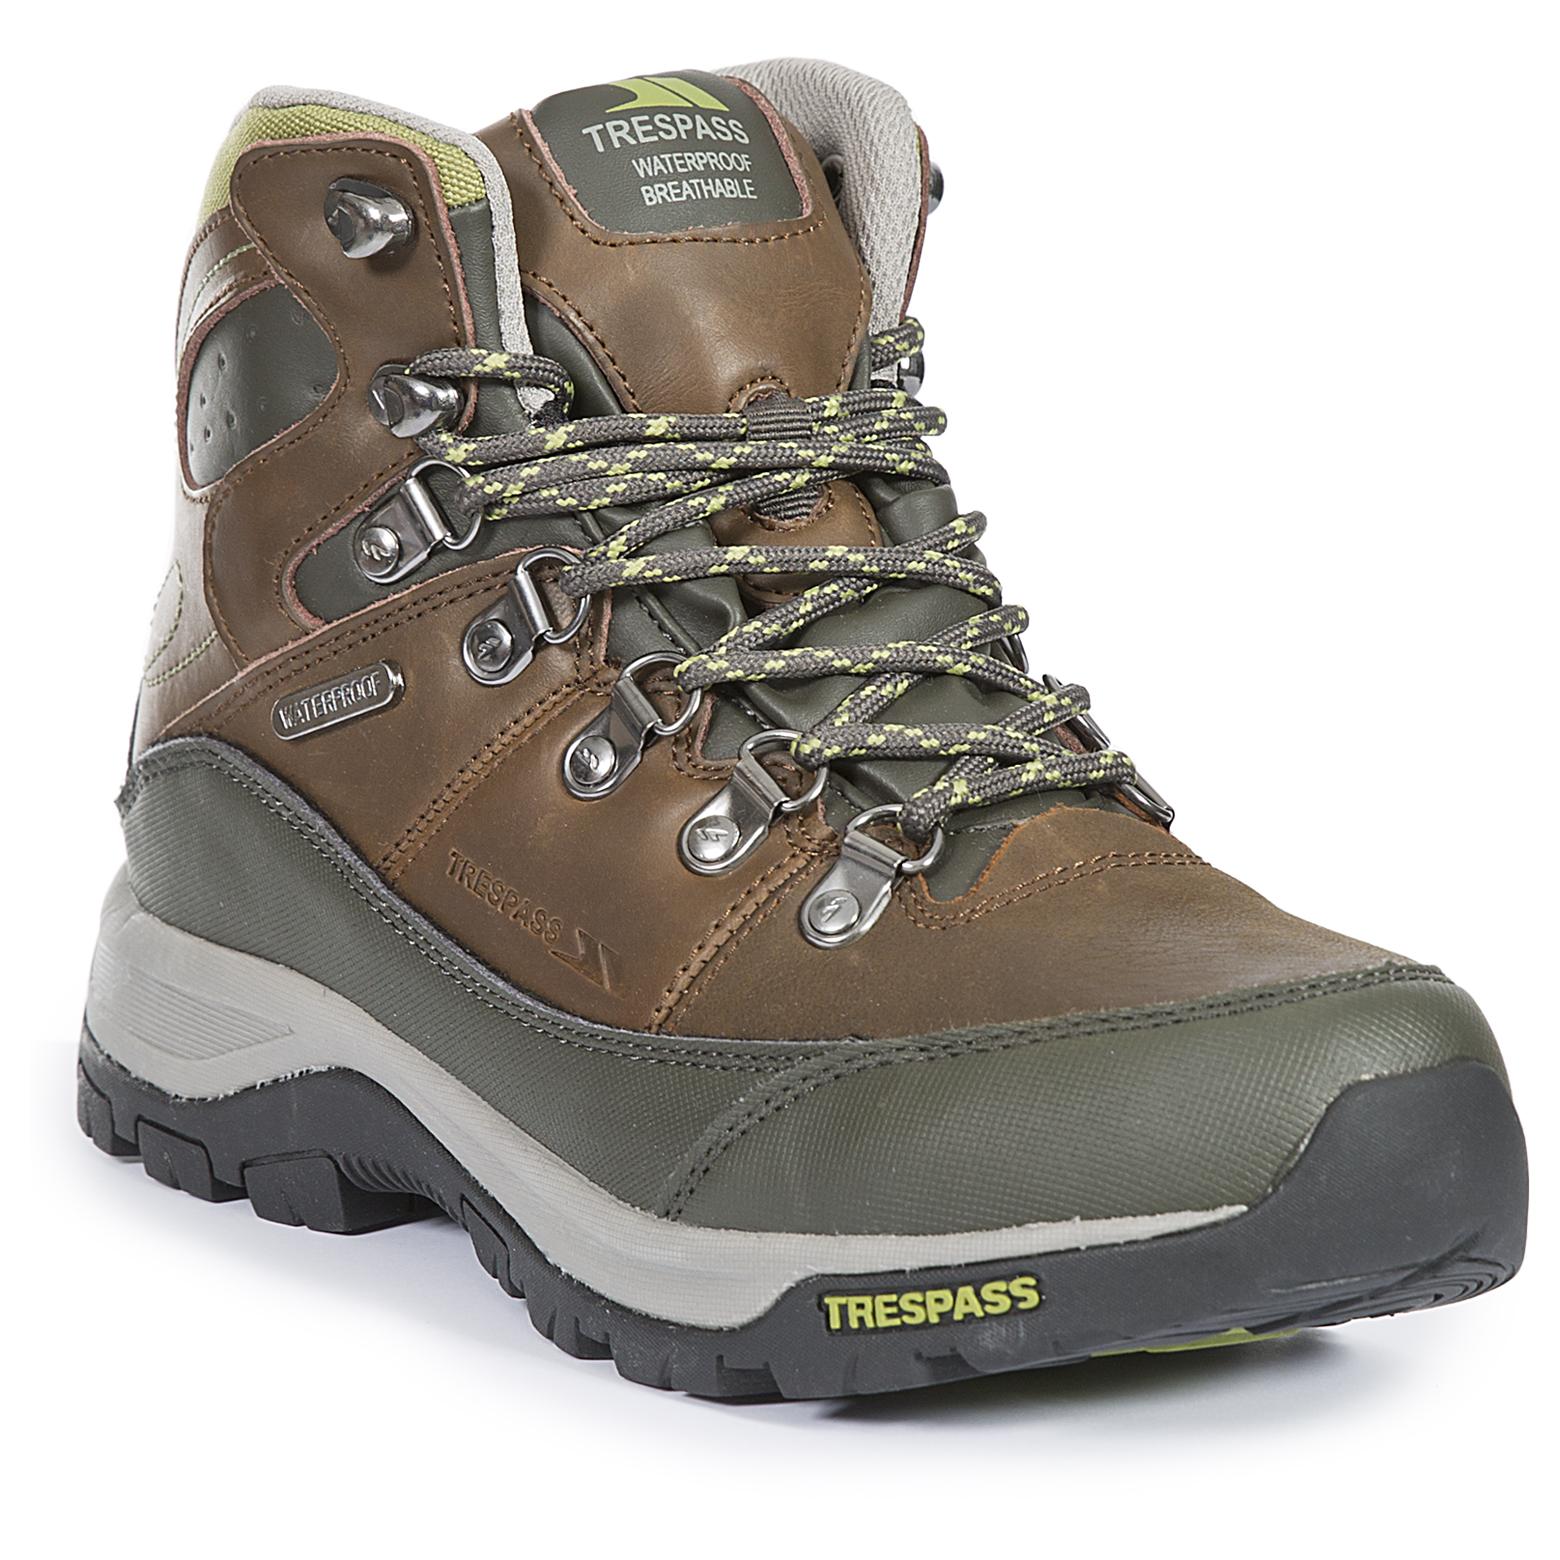 trespass tarn womens hiking boots waterproof leather